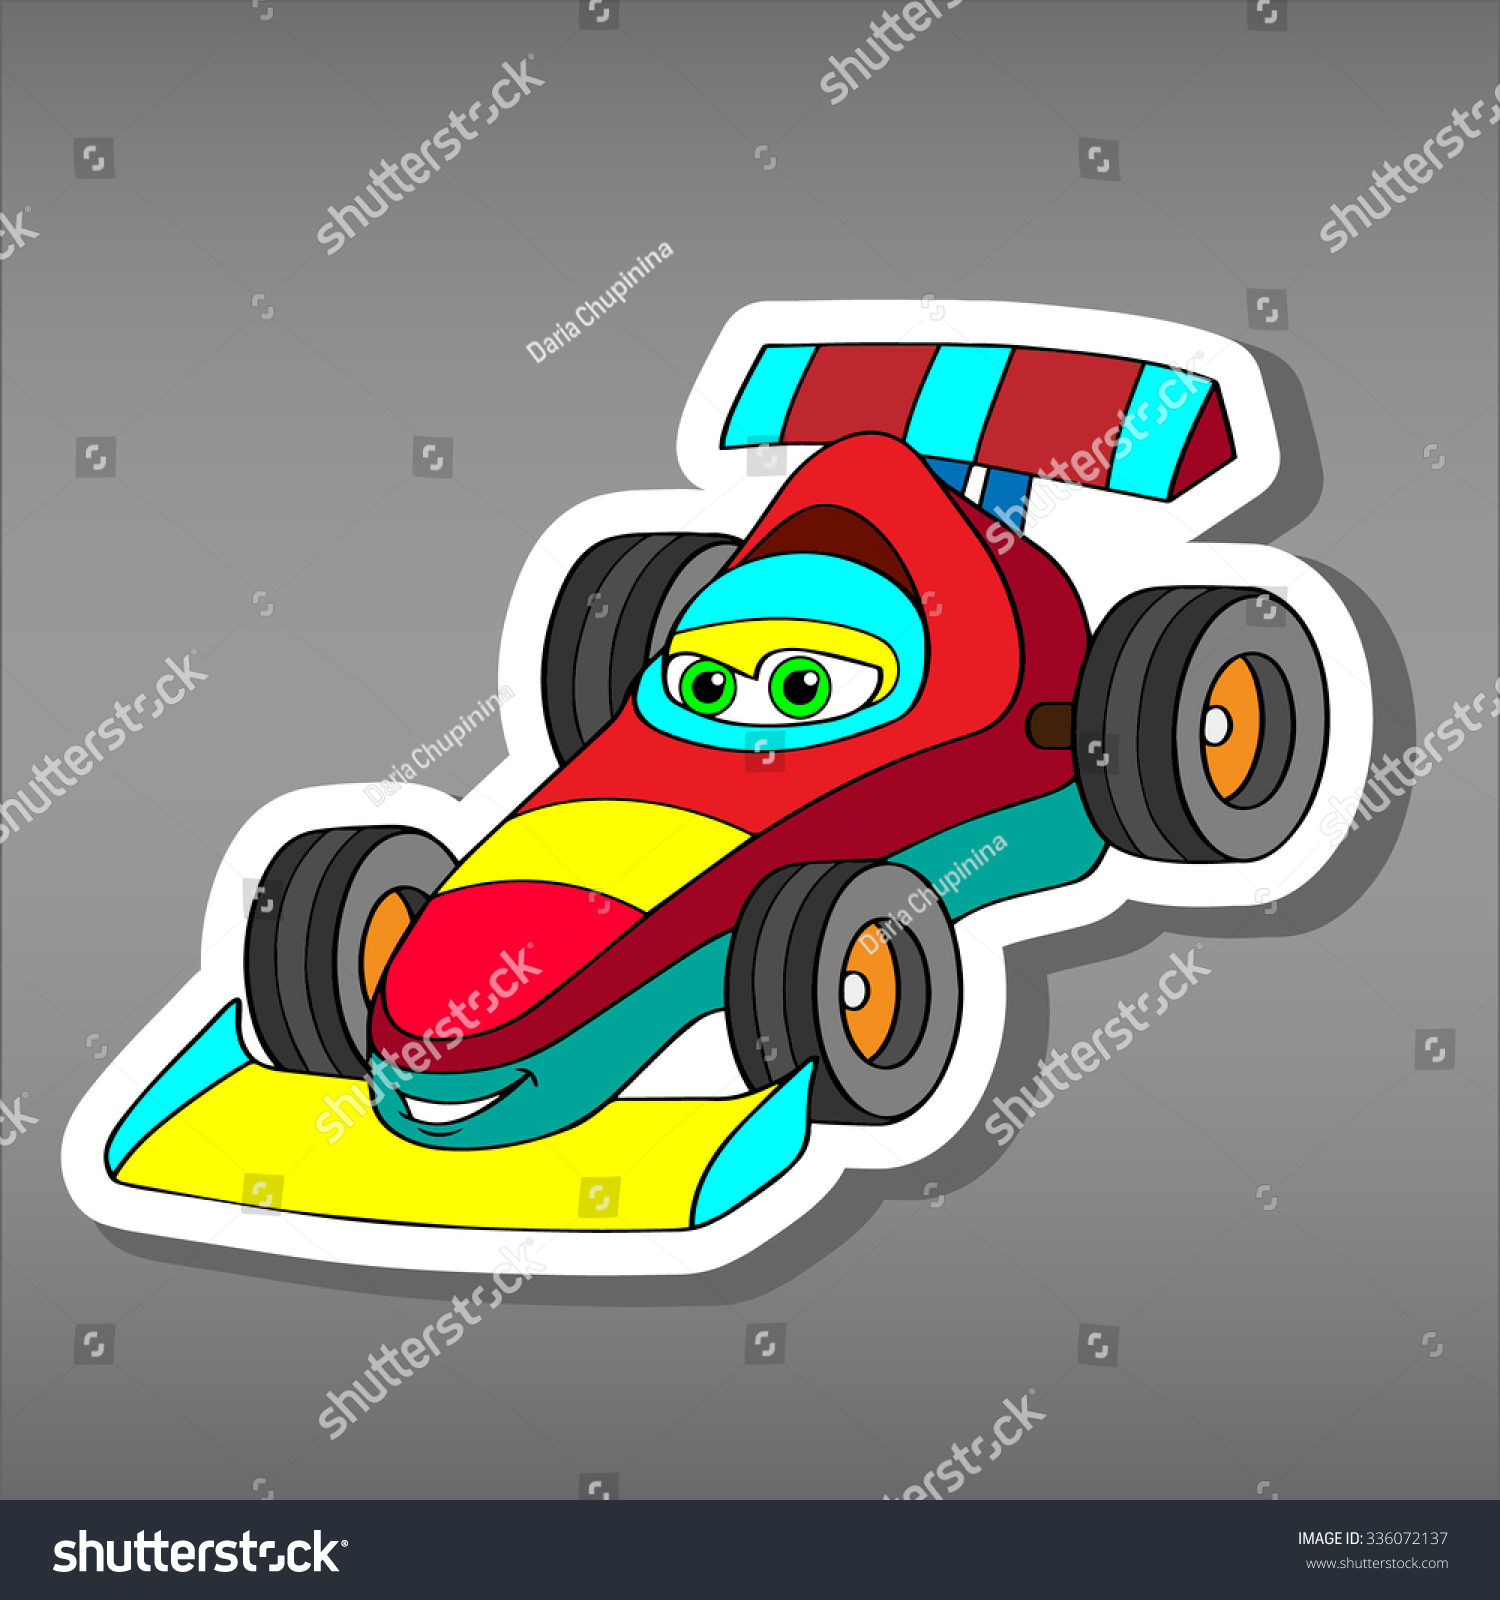 Car design sticker rally - Cartoon Sport Car Sticker For Boys Vector Illustration For Scrapbook Transportation Doodle Background